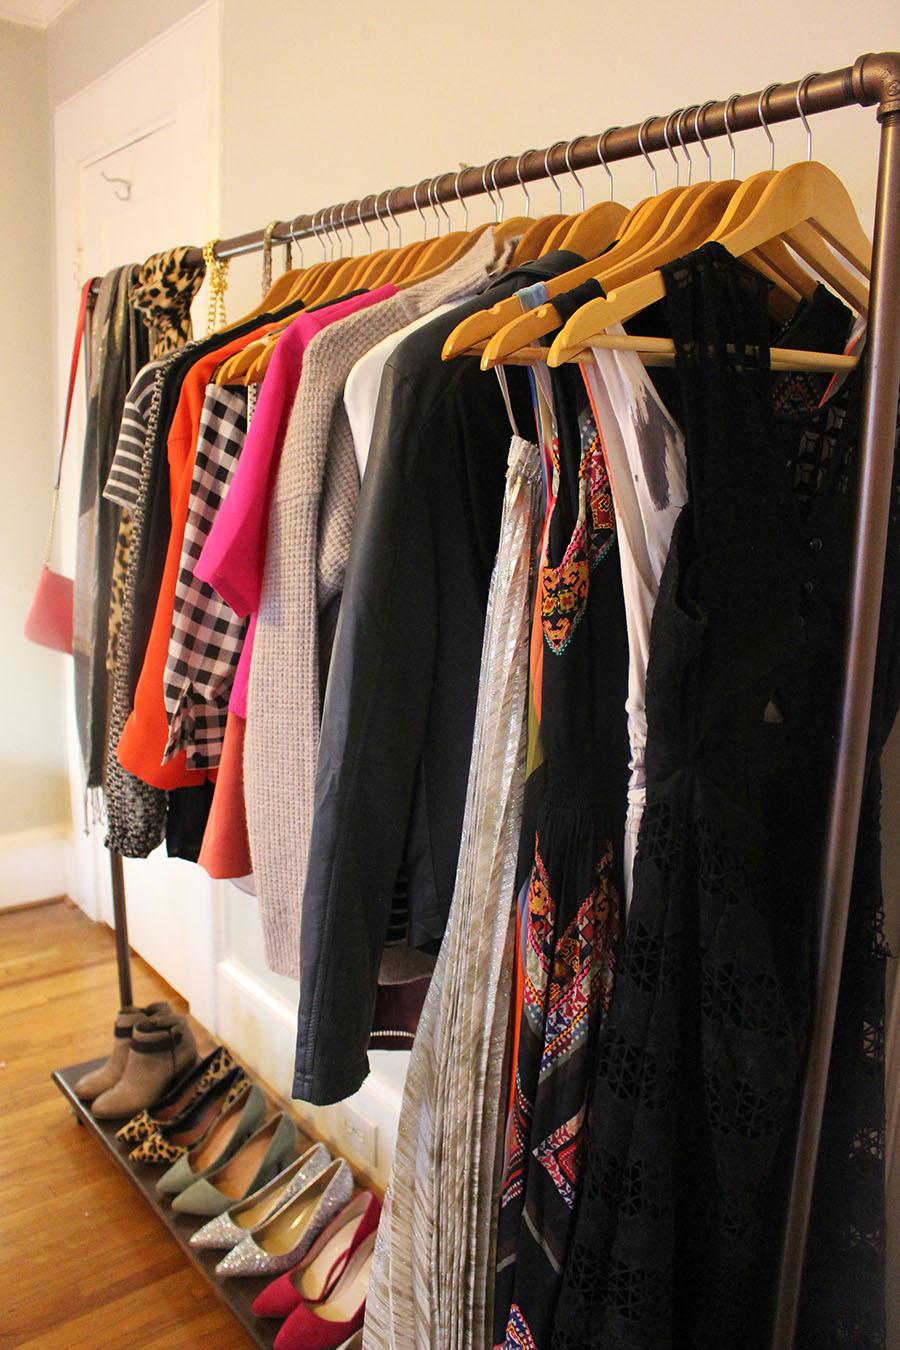 clothing-rack-diy-how-to-make-a-clothing-rack